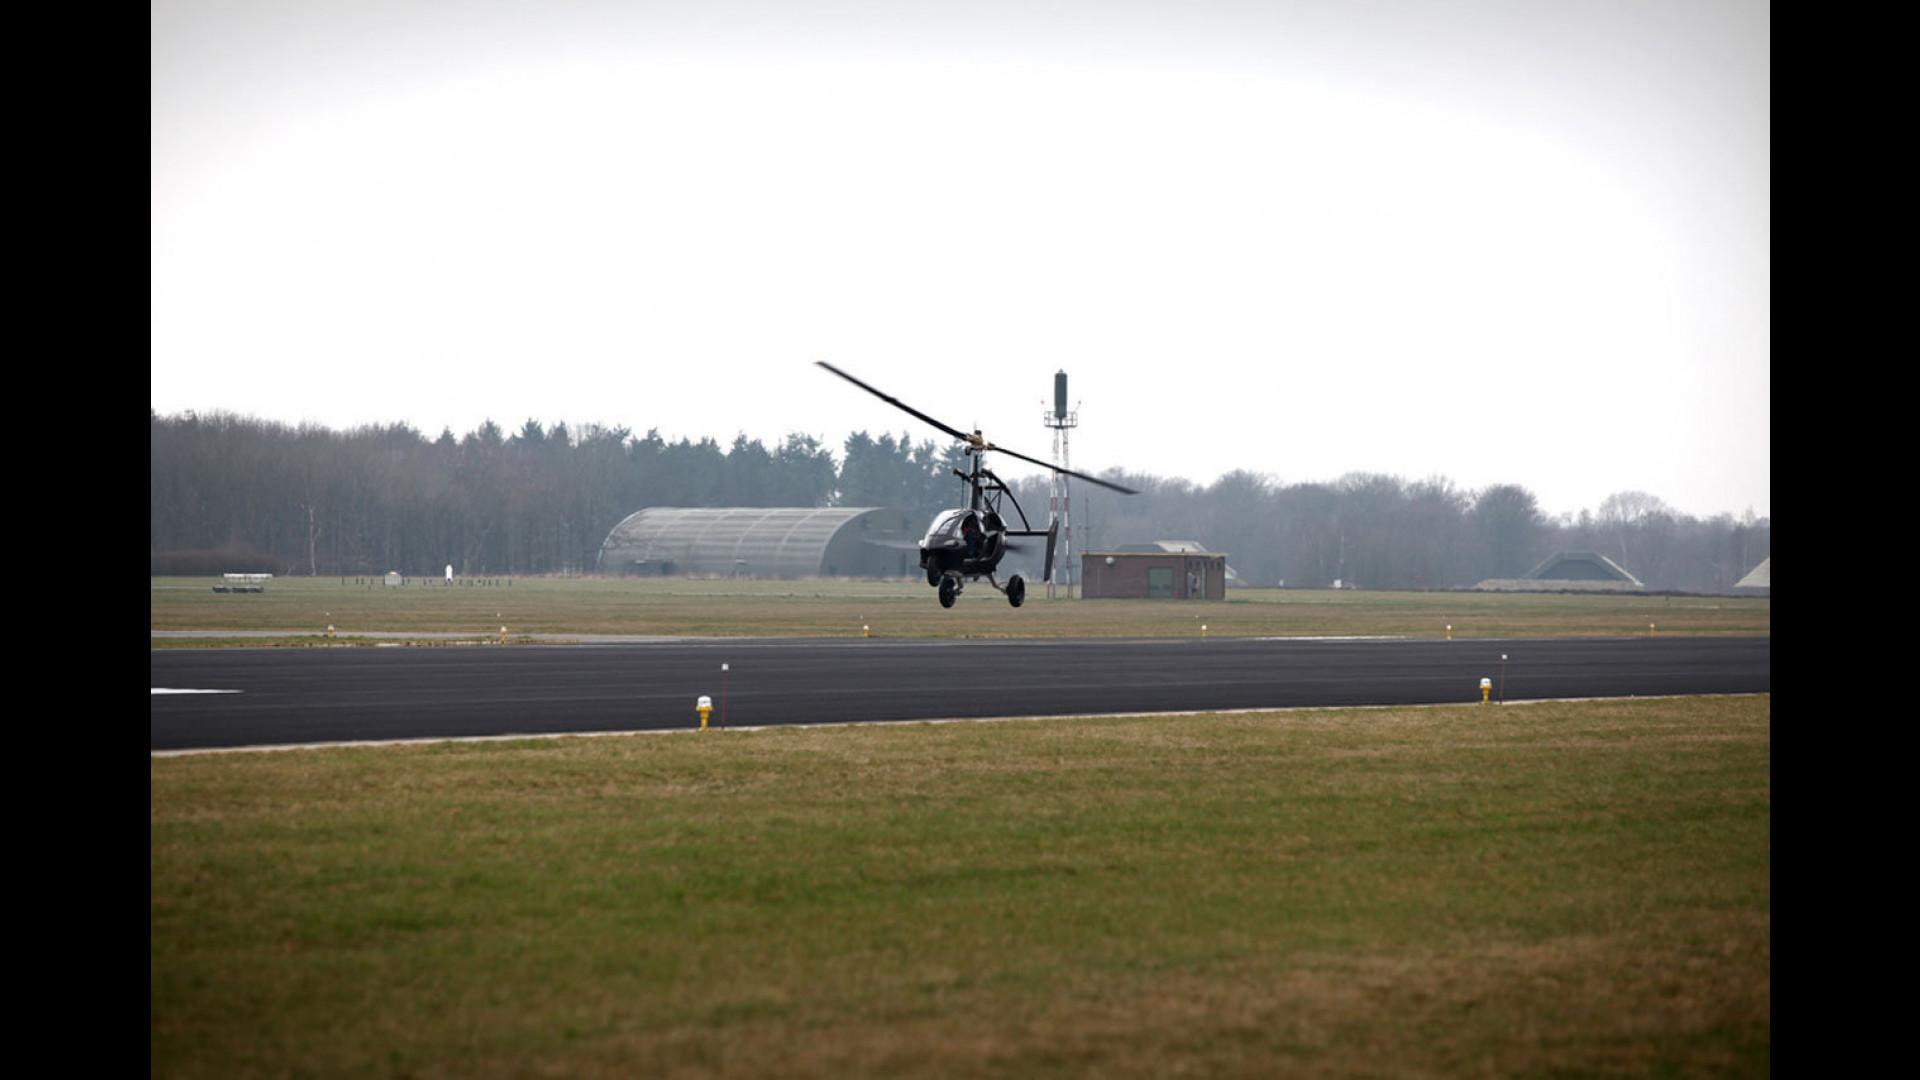 Km H Elicottero : Rc elicottero rayline r g canali infrarossi